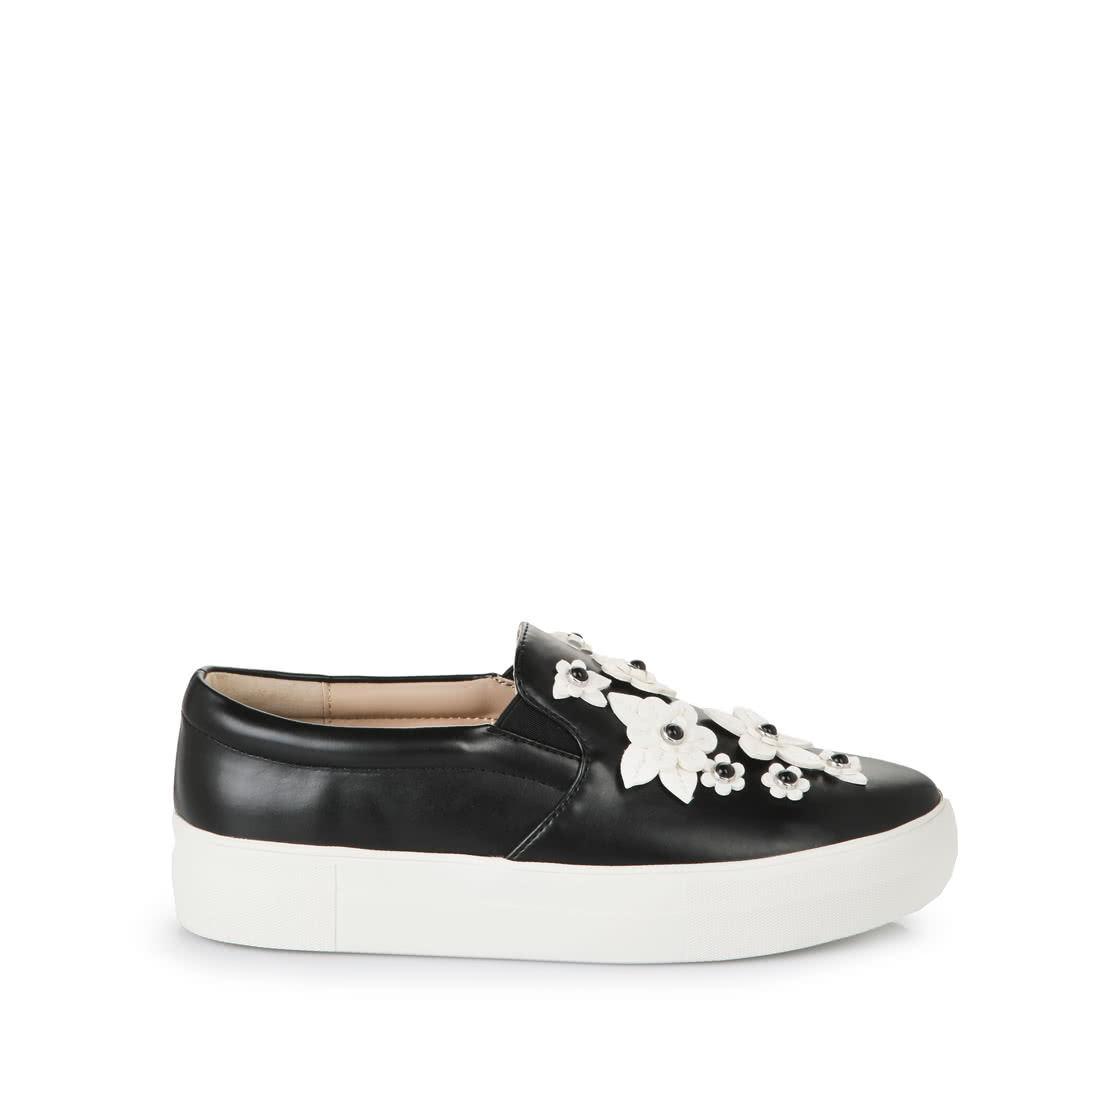 Buy Online Buffalo Shoes